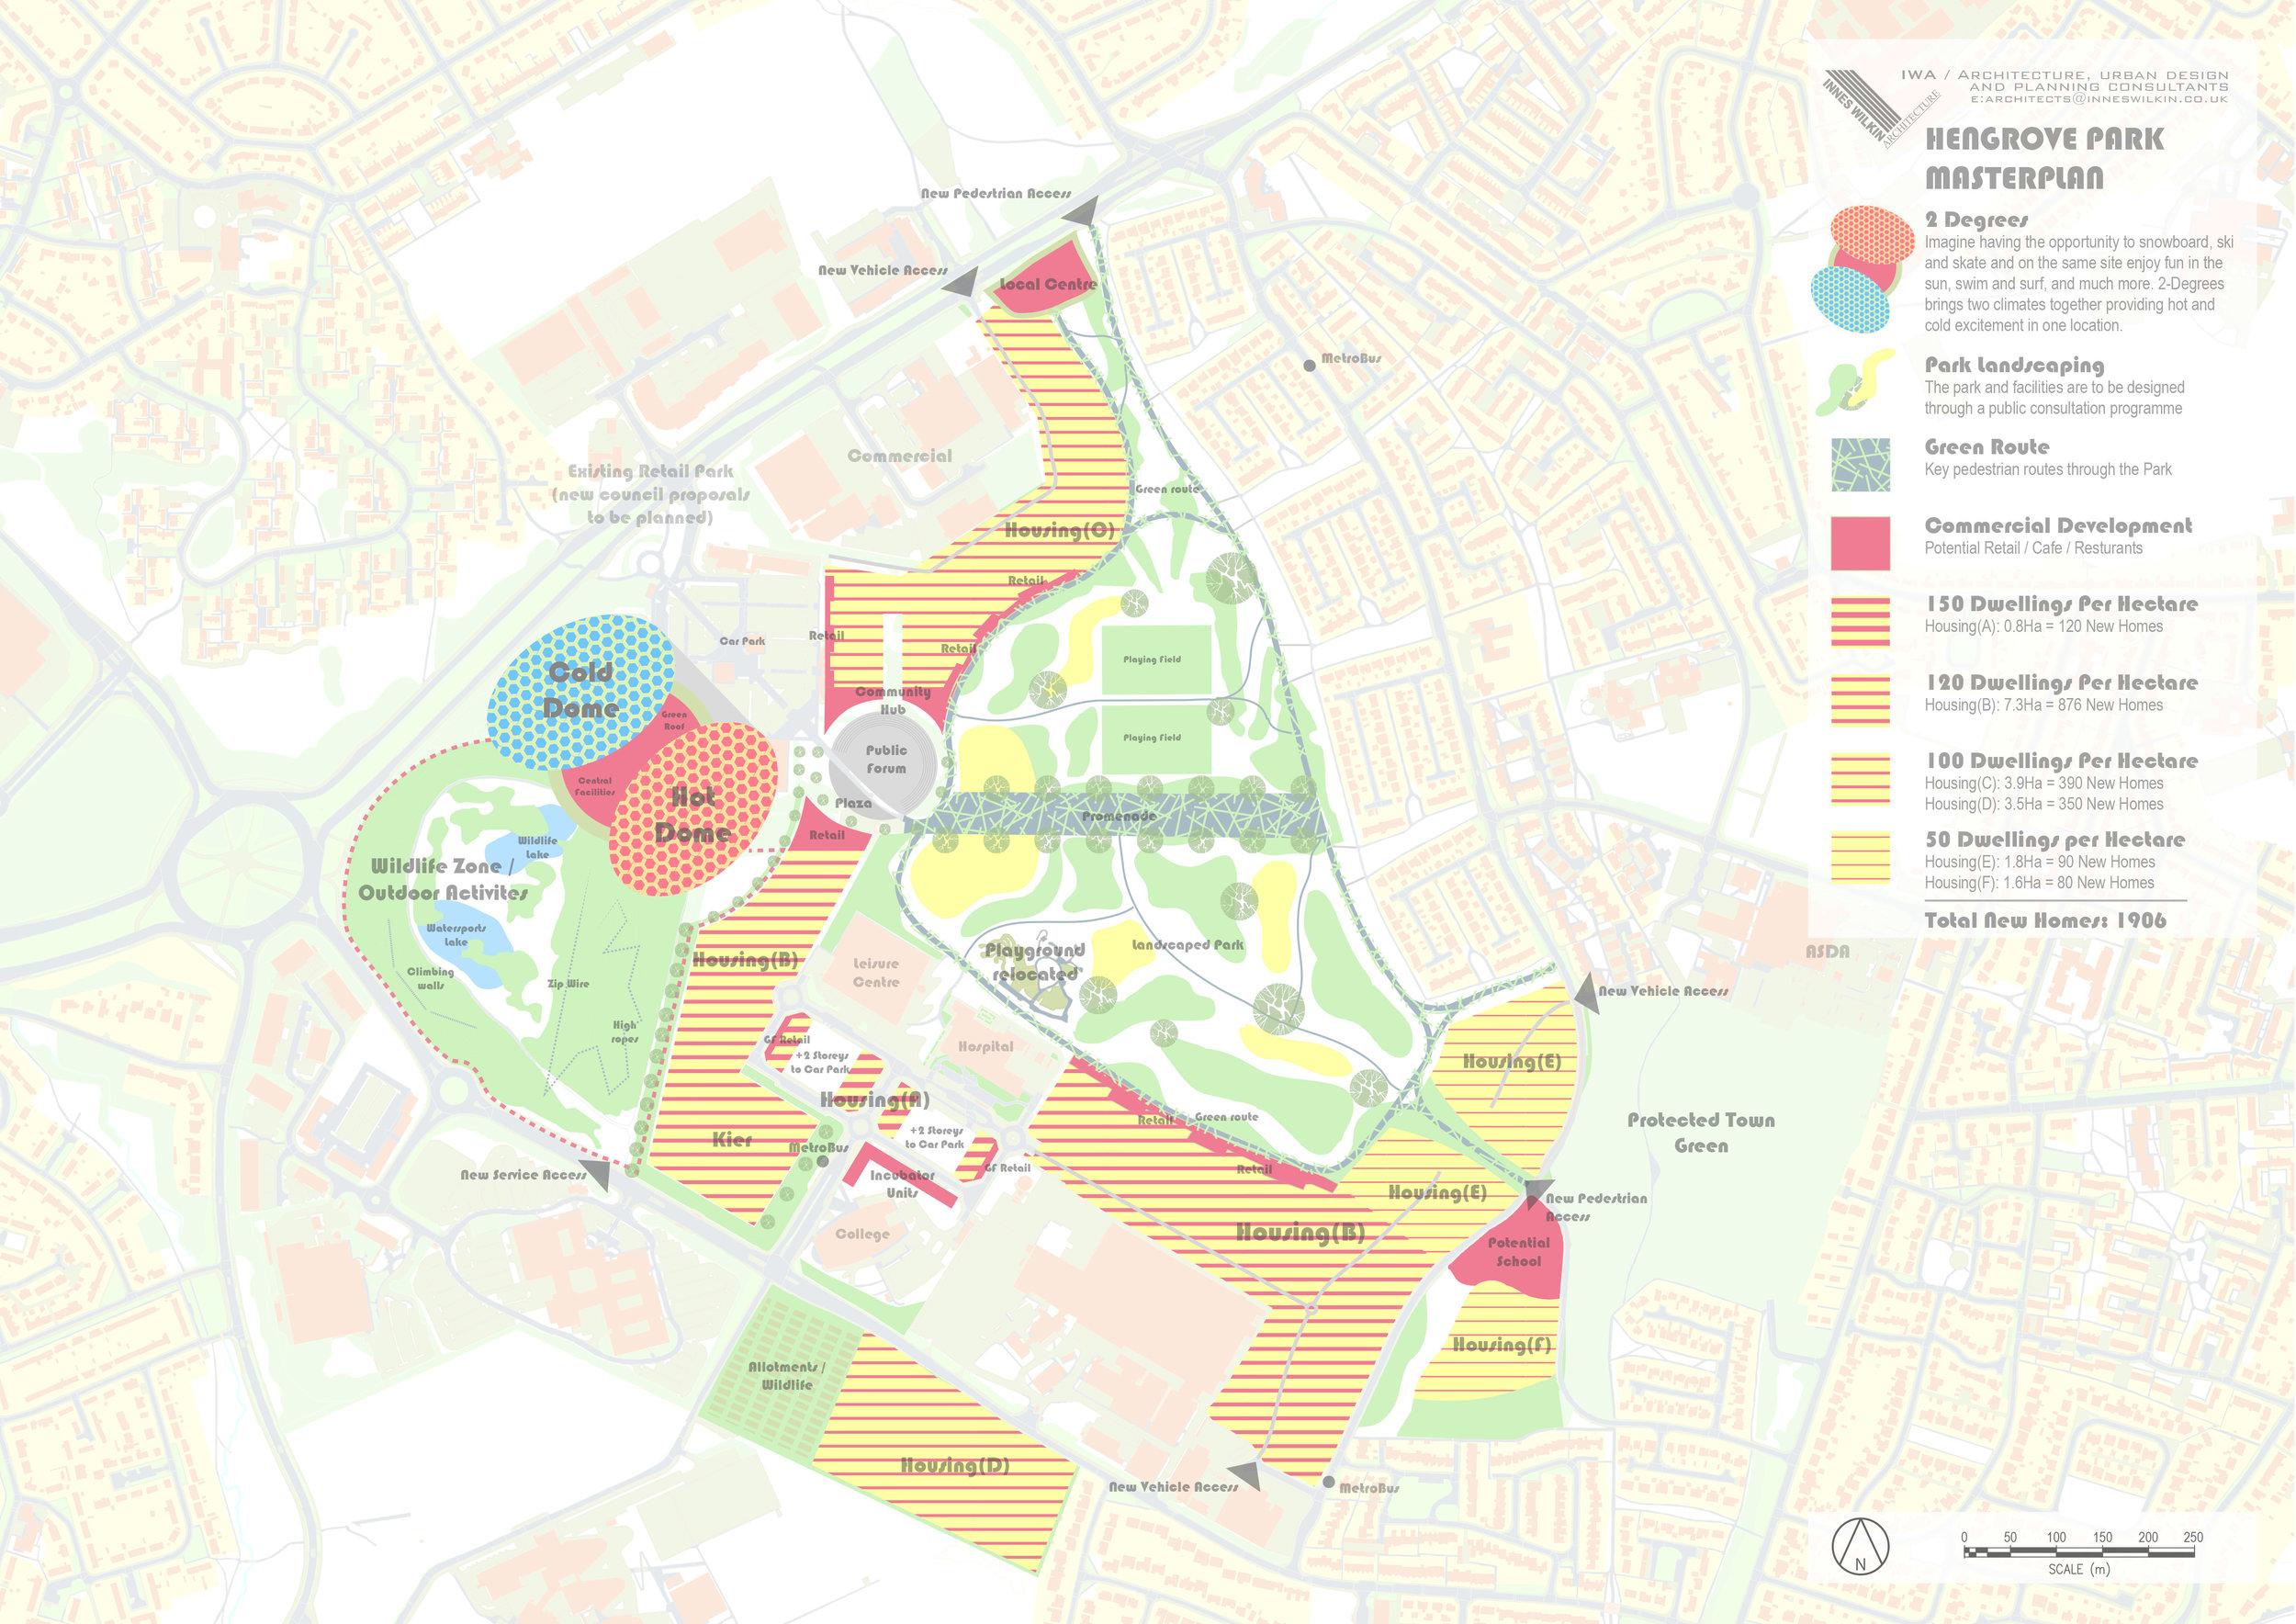 Hengrove Park Masterplan_2016.jpg